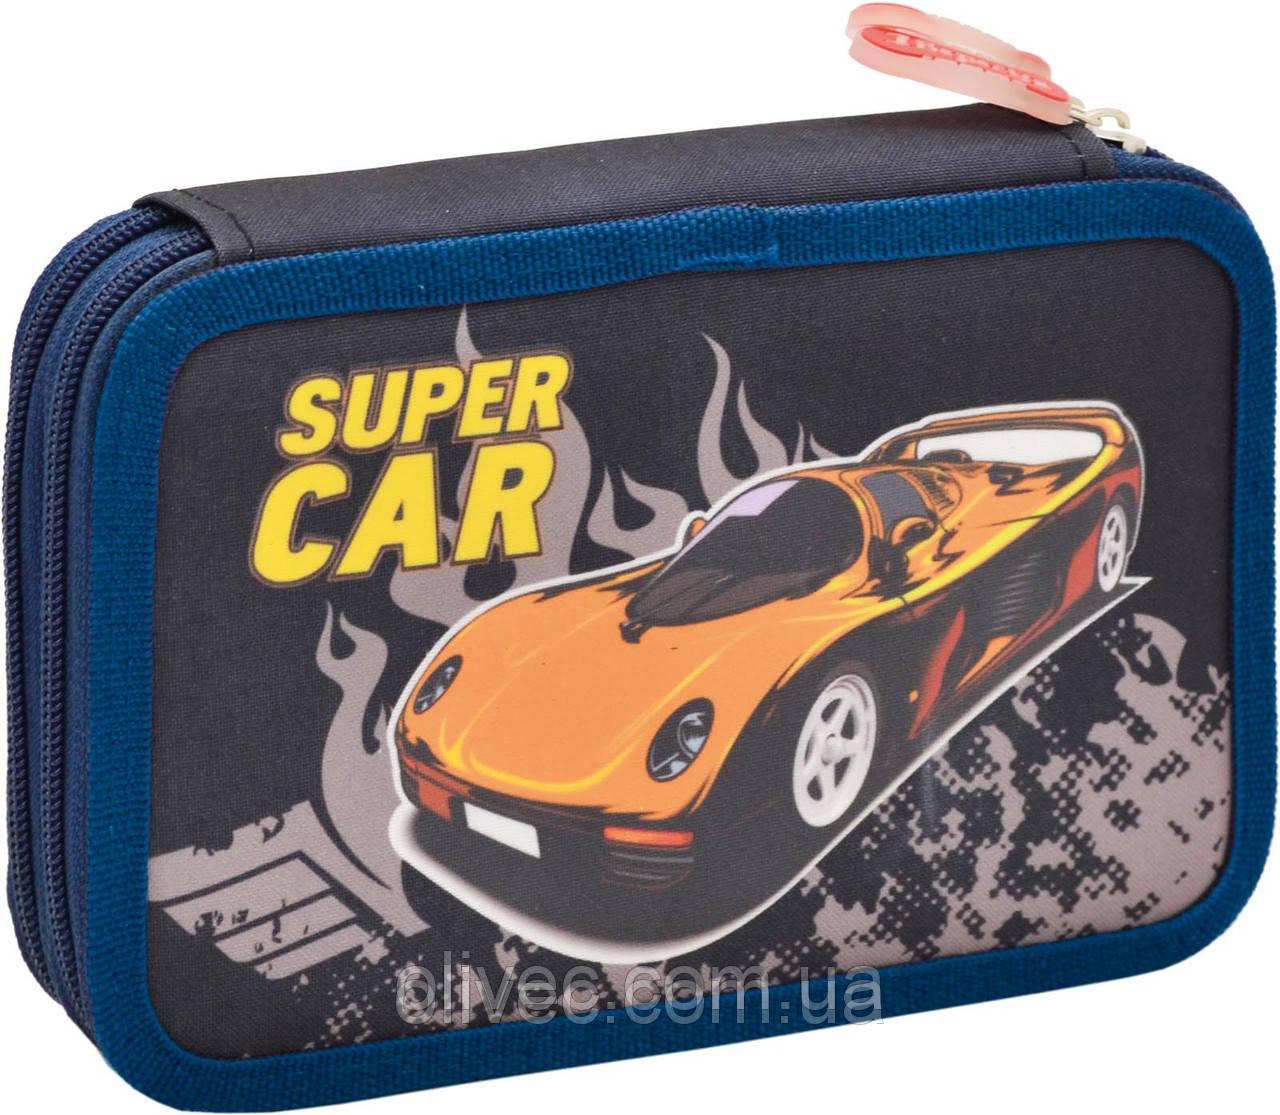 "Пенал двойной ""Super Car"" 19,5х12,5х4,2 см."